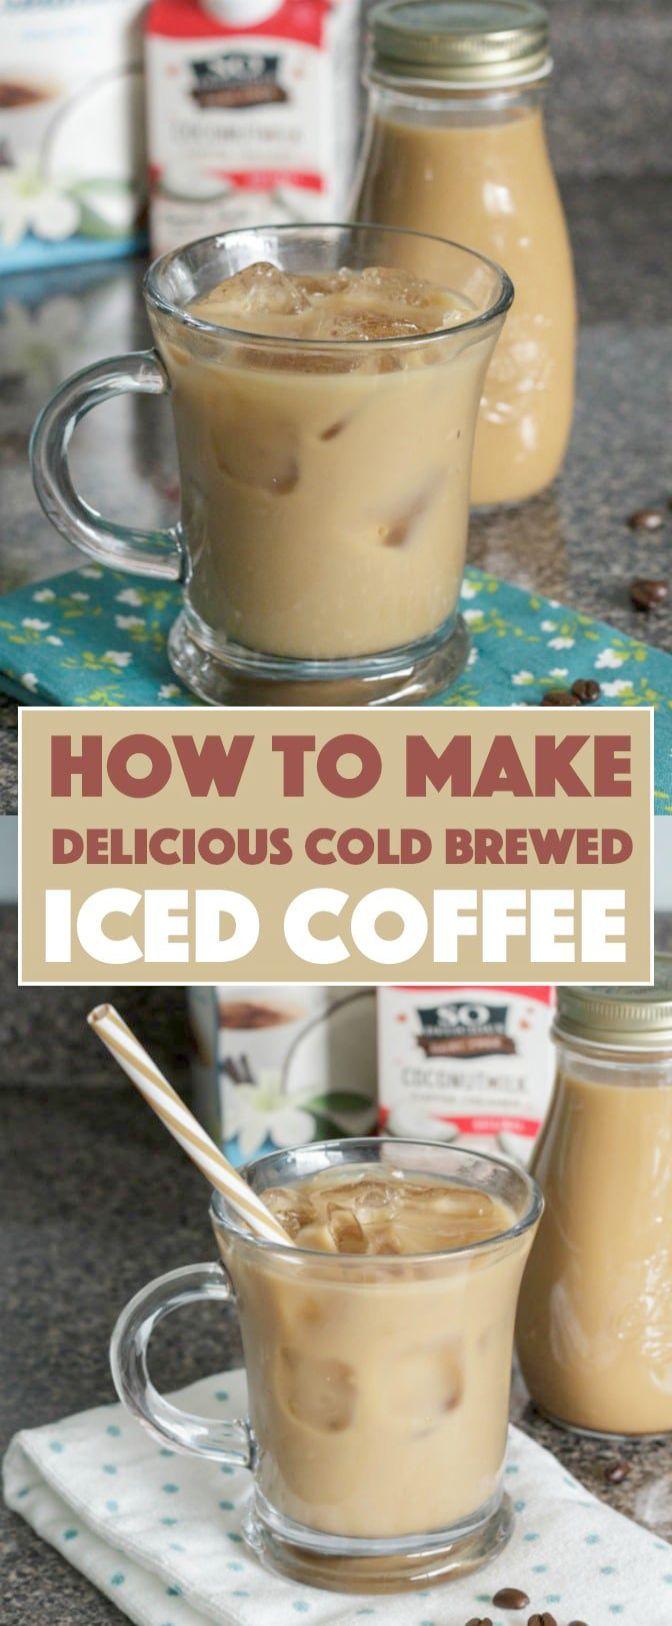 Best Coffee Drinks With Coconut Milk Coffee Meets Bagel Ipo Coffee Near Me Tripadvisor Across Iced Coffee Recipe Easy Cold Coffee Recipes Iced Coffee Drinks